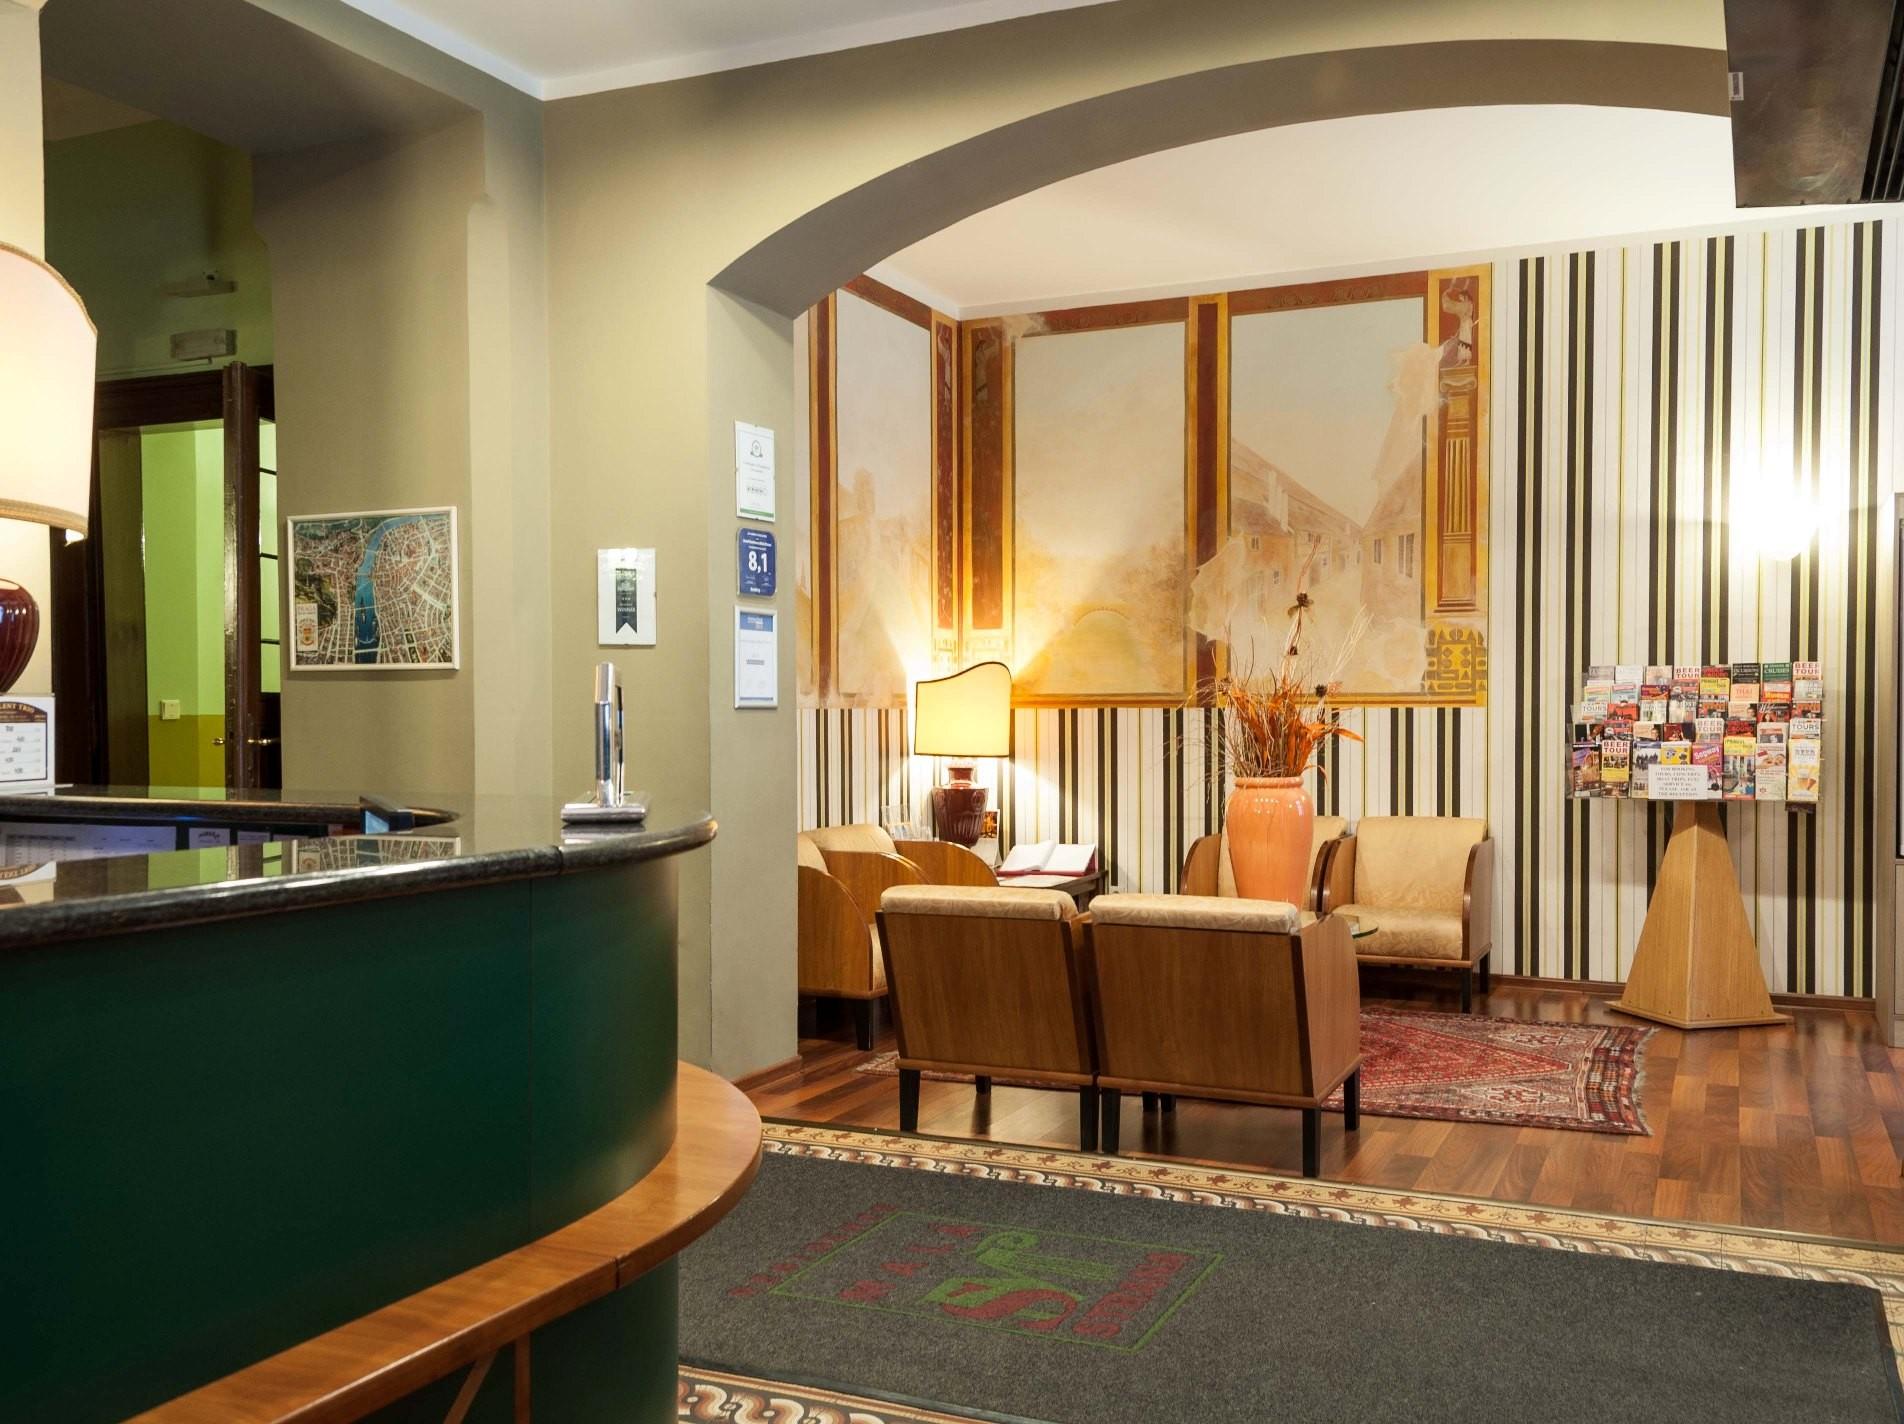 Garzotto hotels spa hotels in marienbad prague for Hotel mala strana